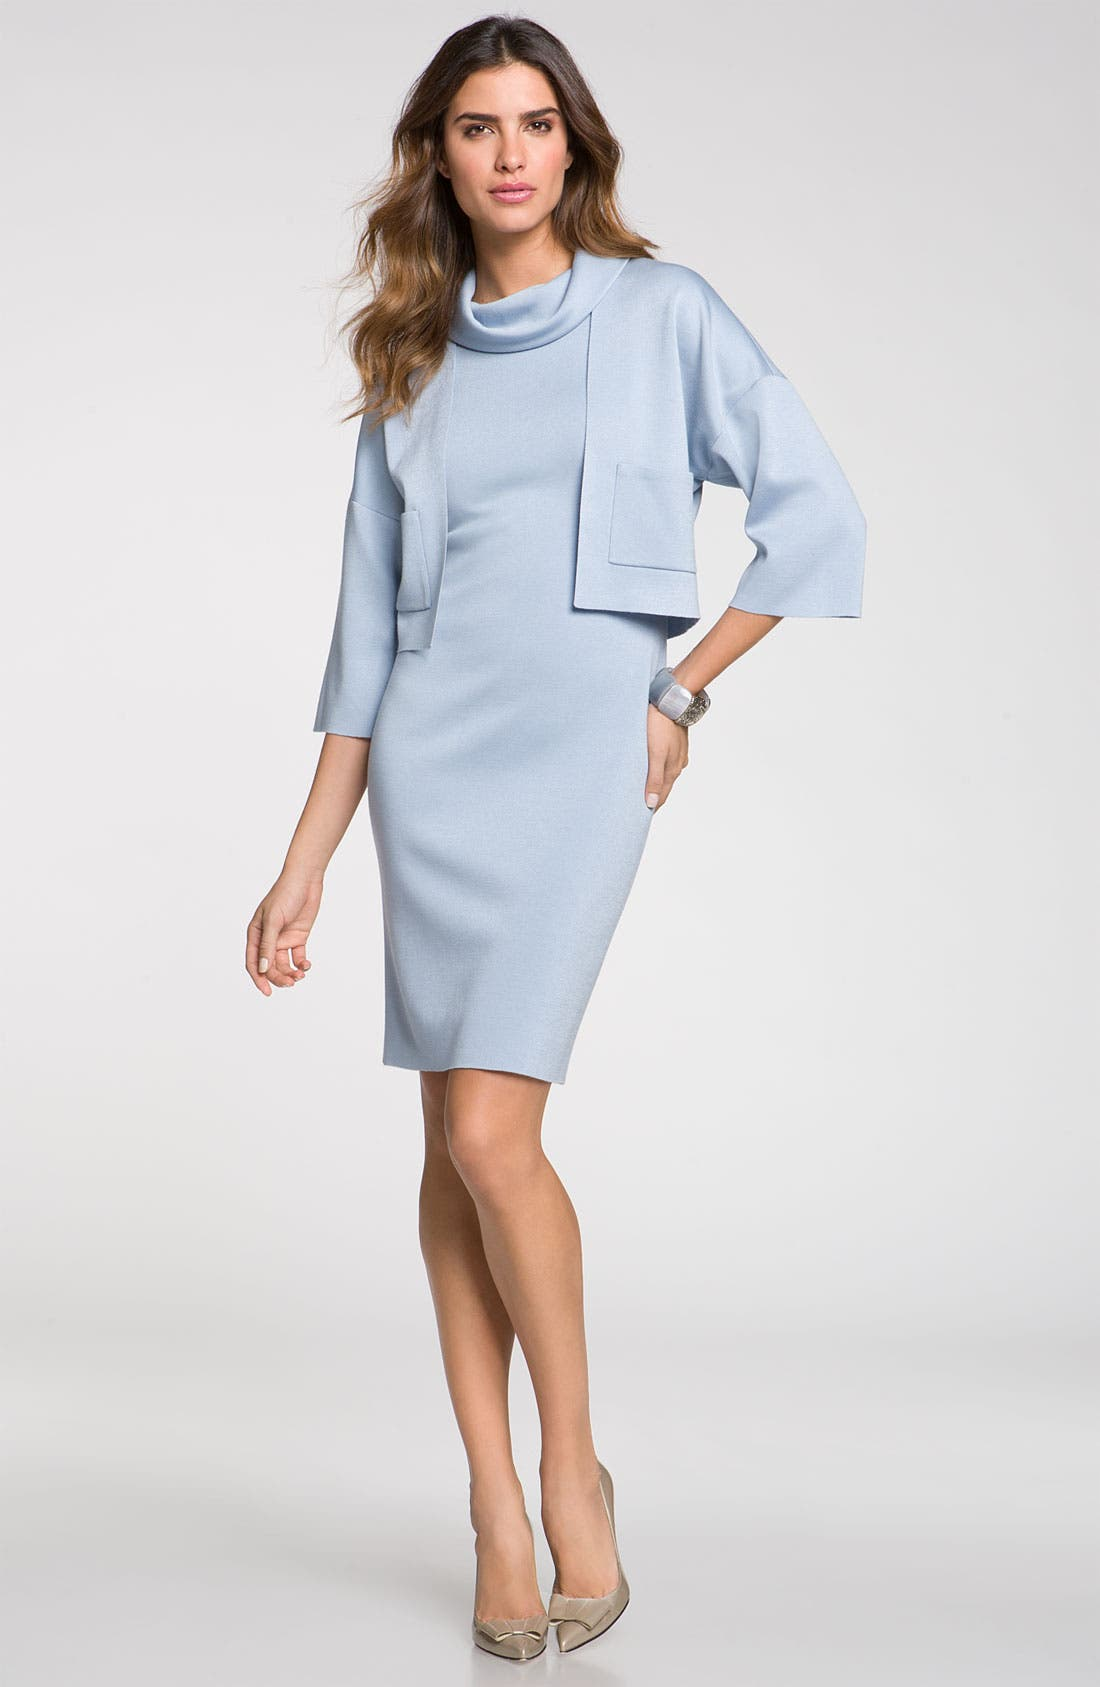 Alternate Image 1 Selected - St. John Collection Jacket & Knit Dress